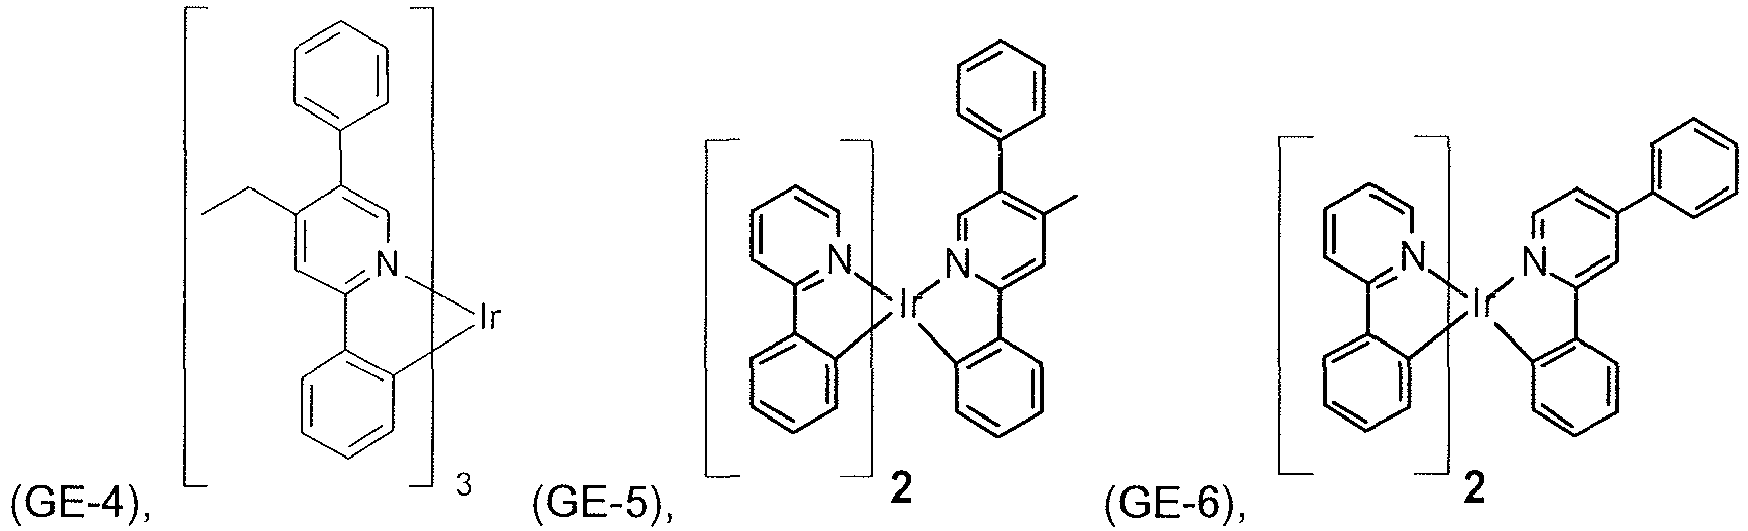 Figure imgb0652